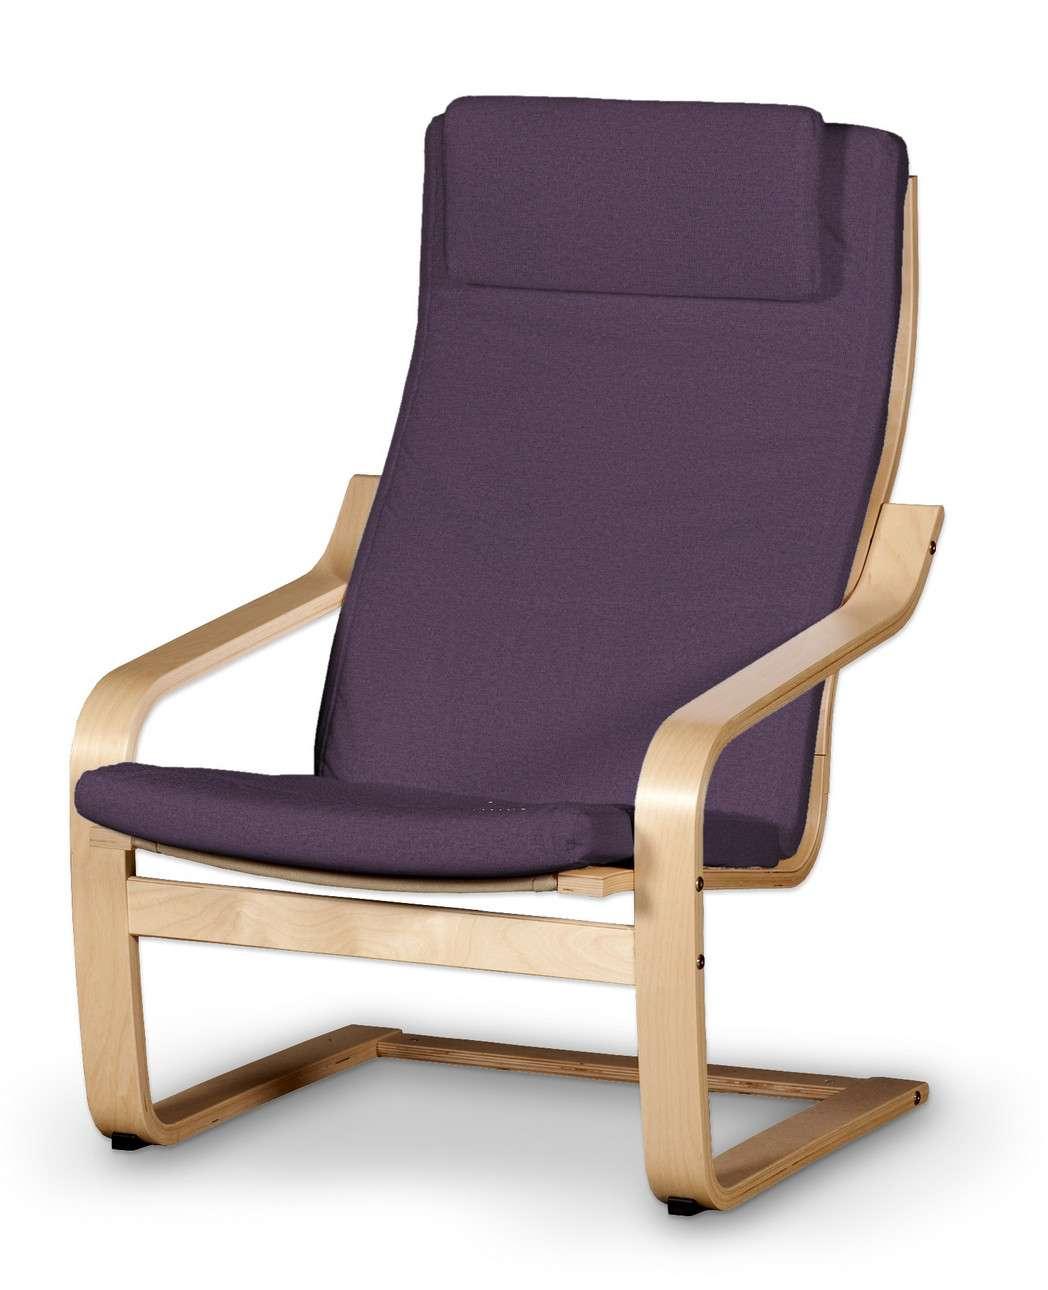 Poduszka na fotel Poäng II w kolekcji Etna, tkanina: 161-27